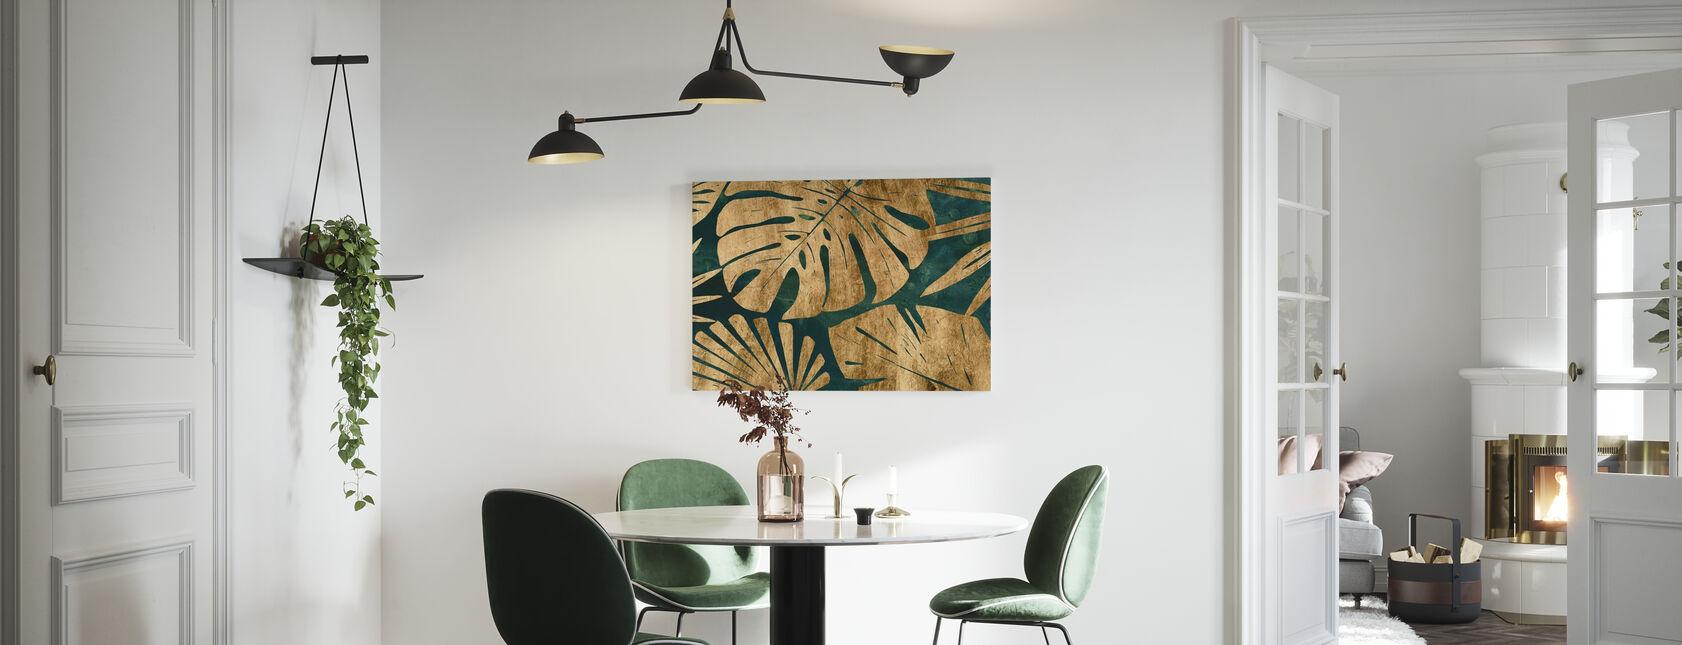 Giungla smeraldo - Stampa su tela - Cucina